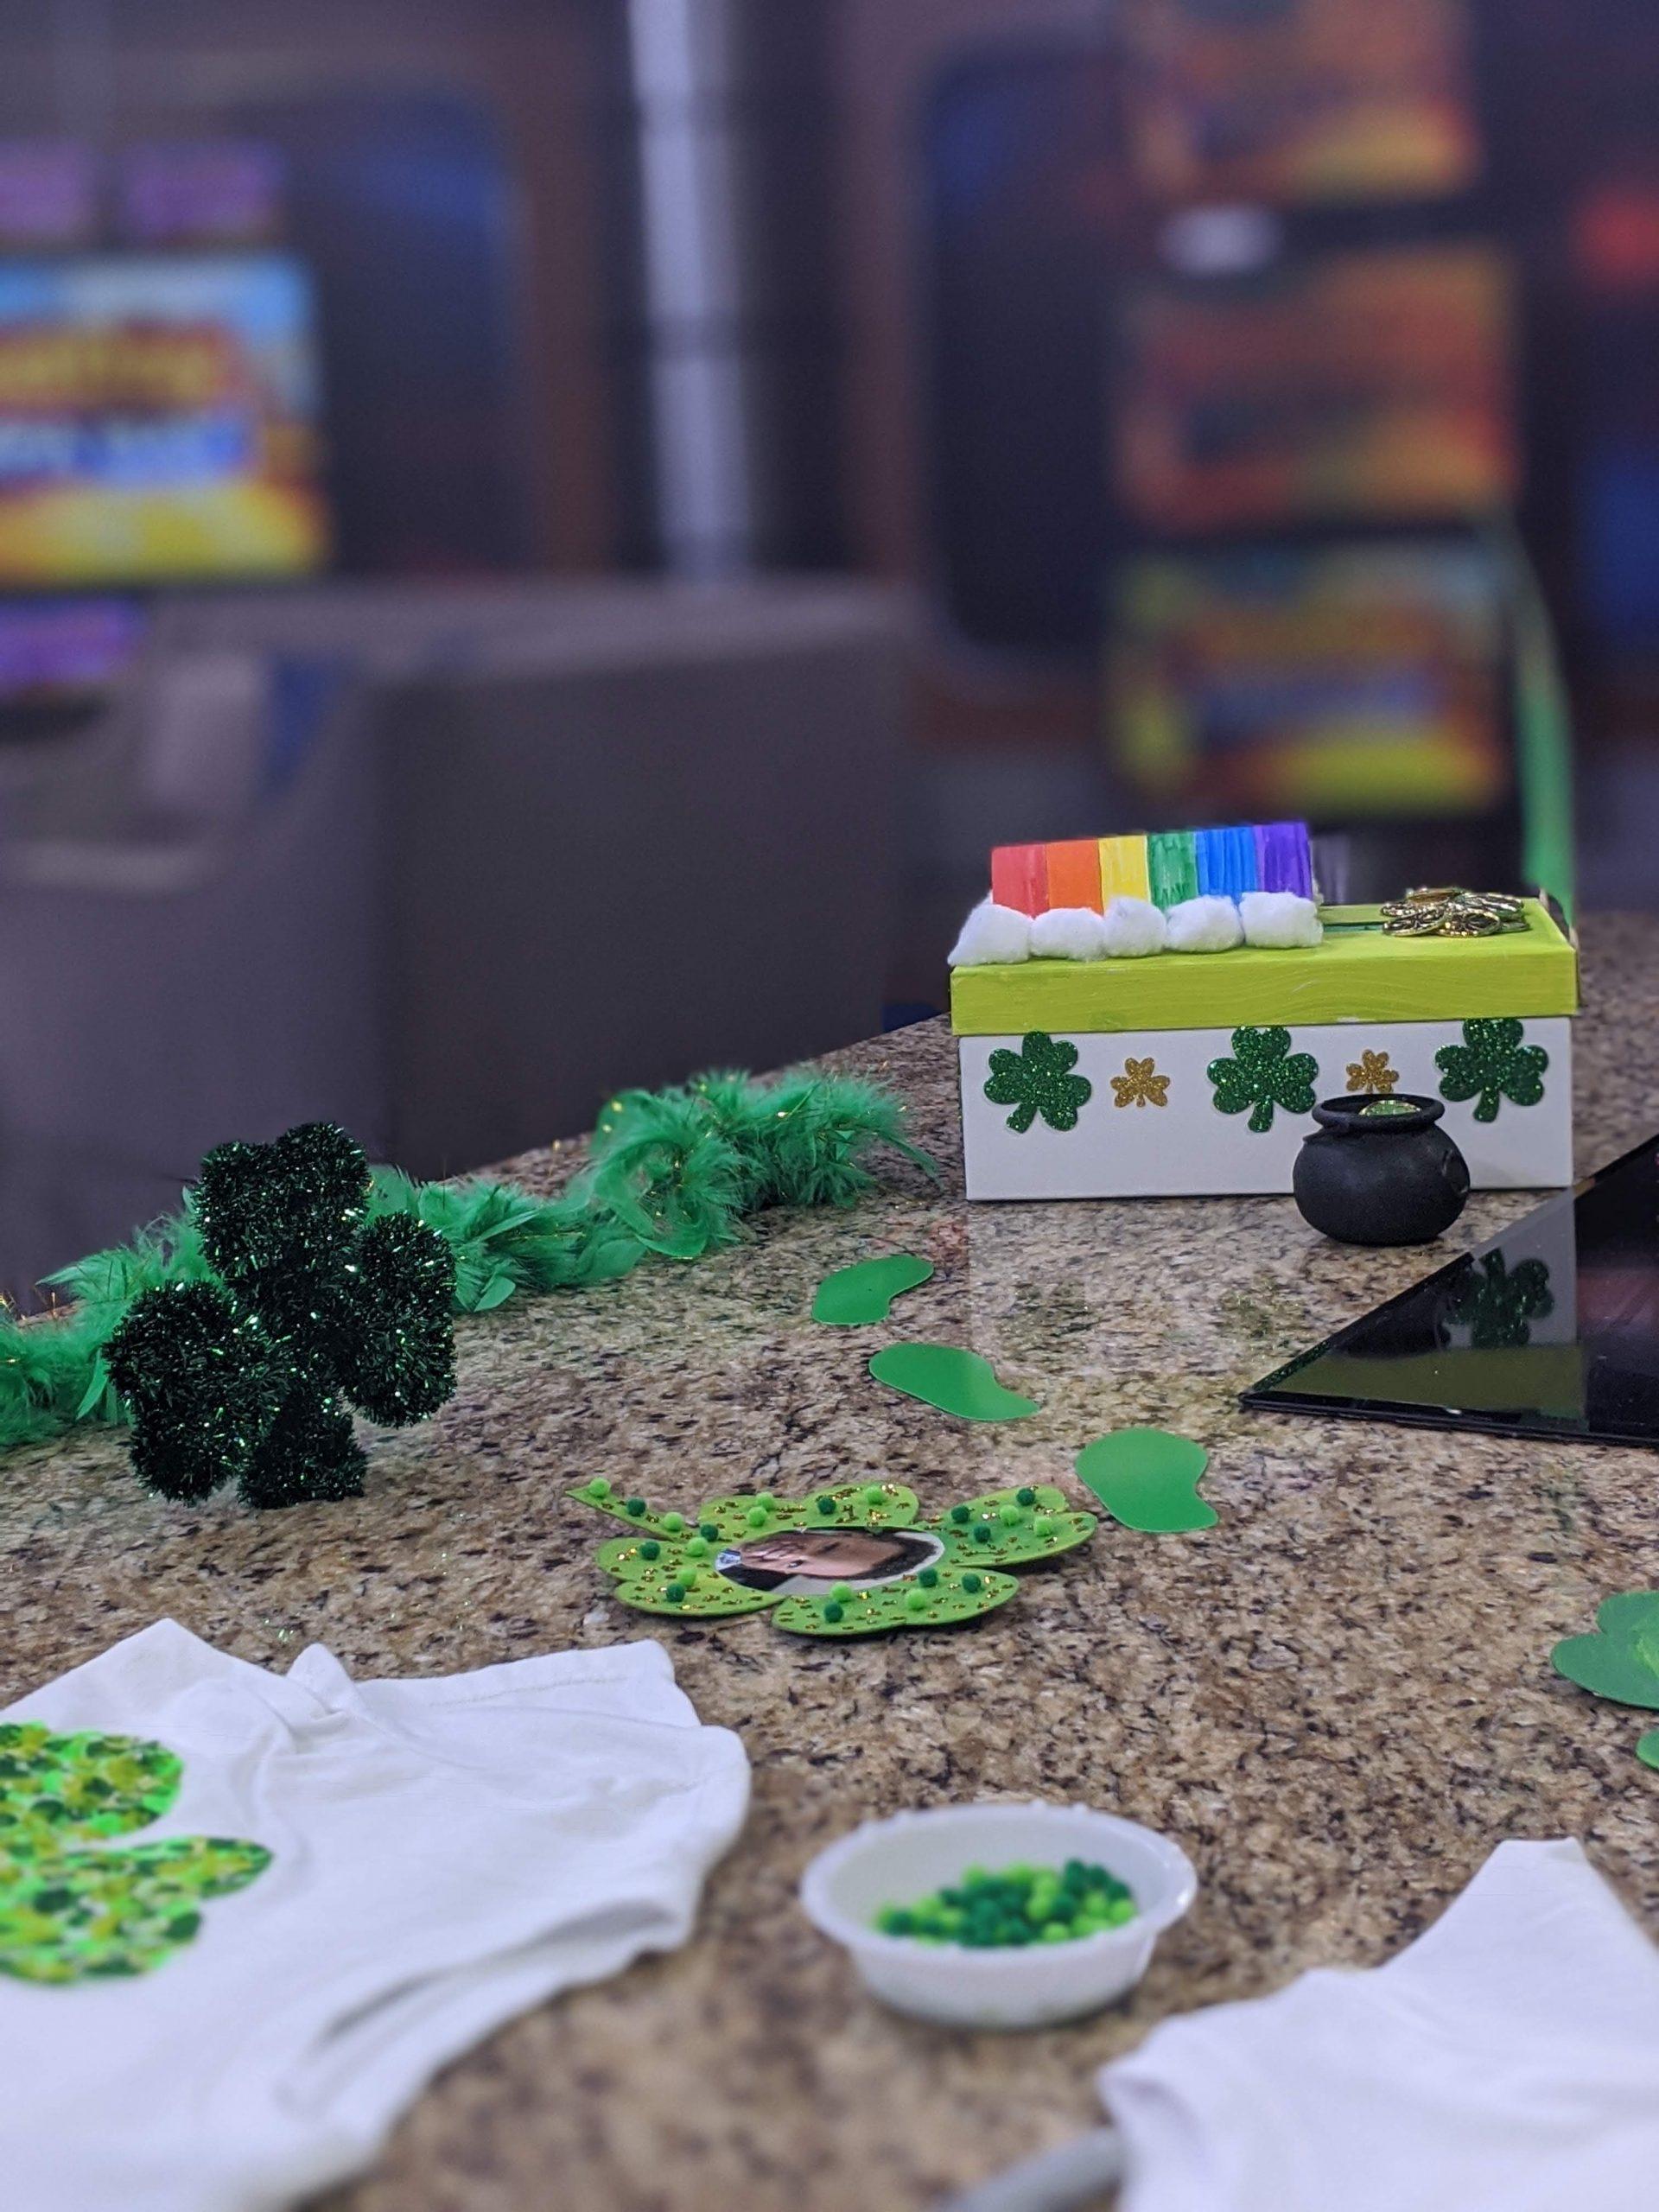 St. Patrick's Day display at Fox 13 News studio